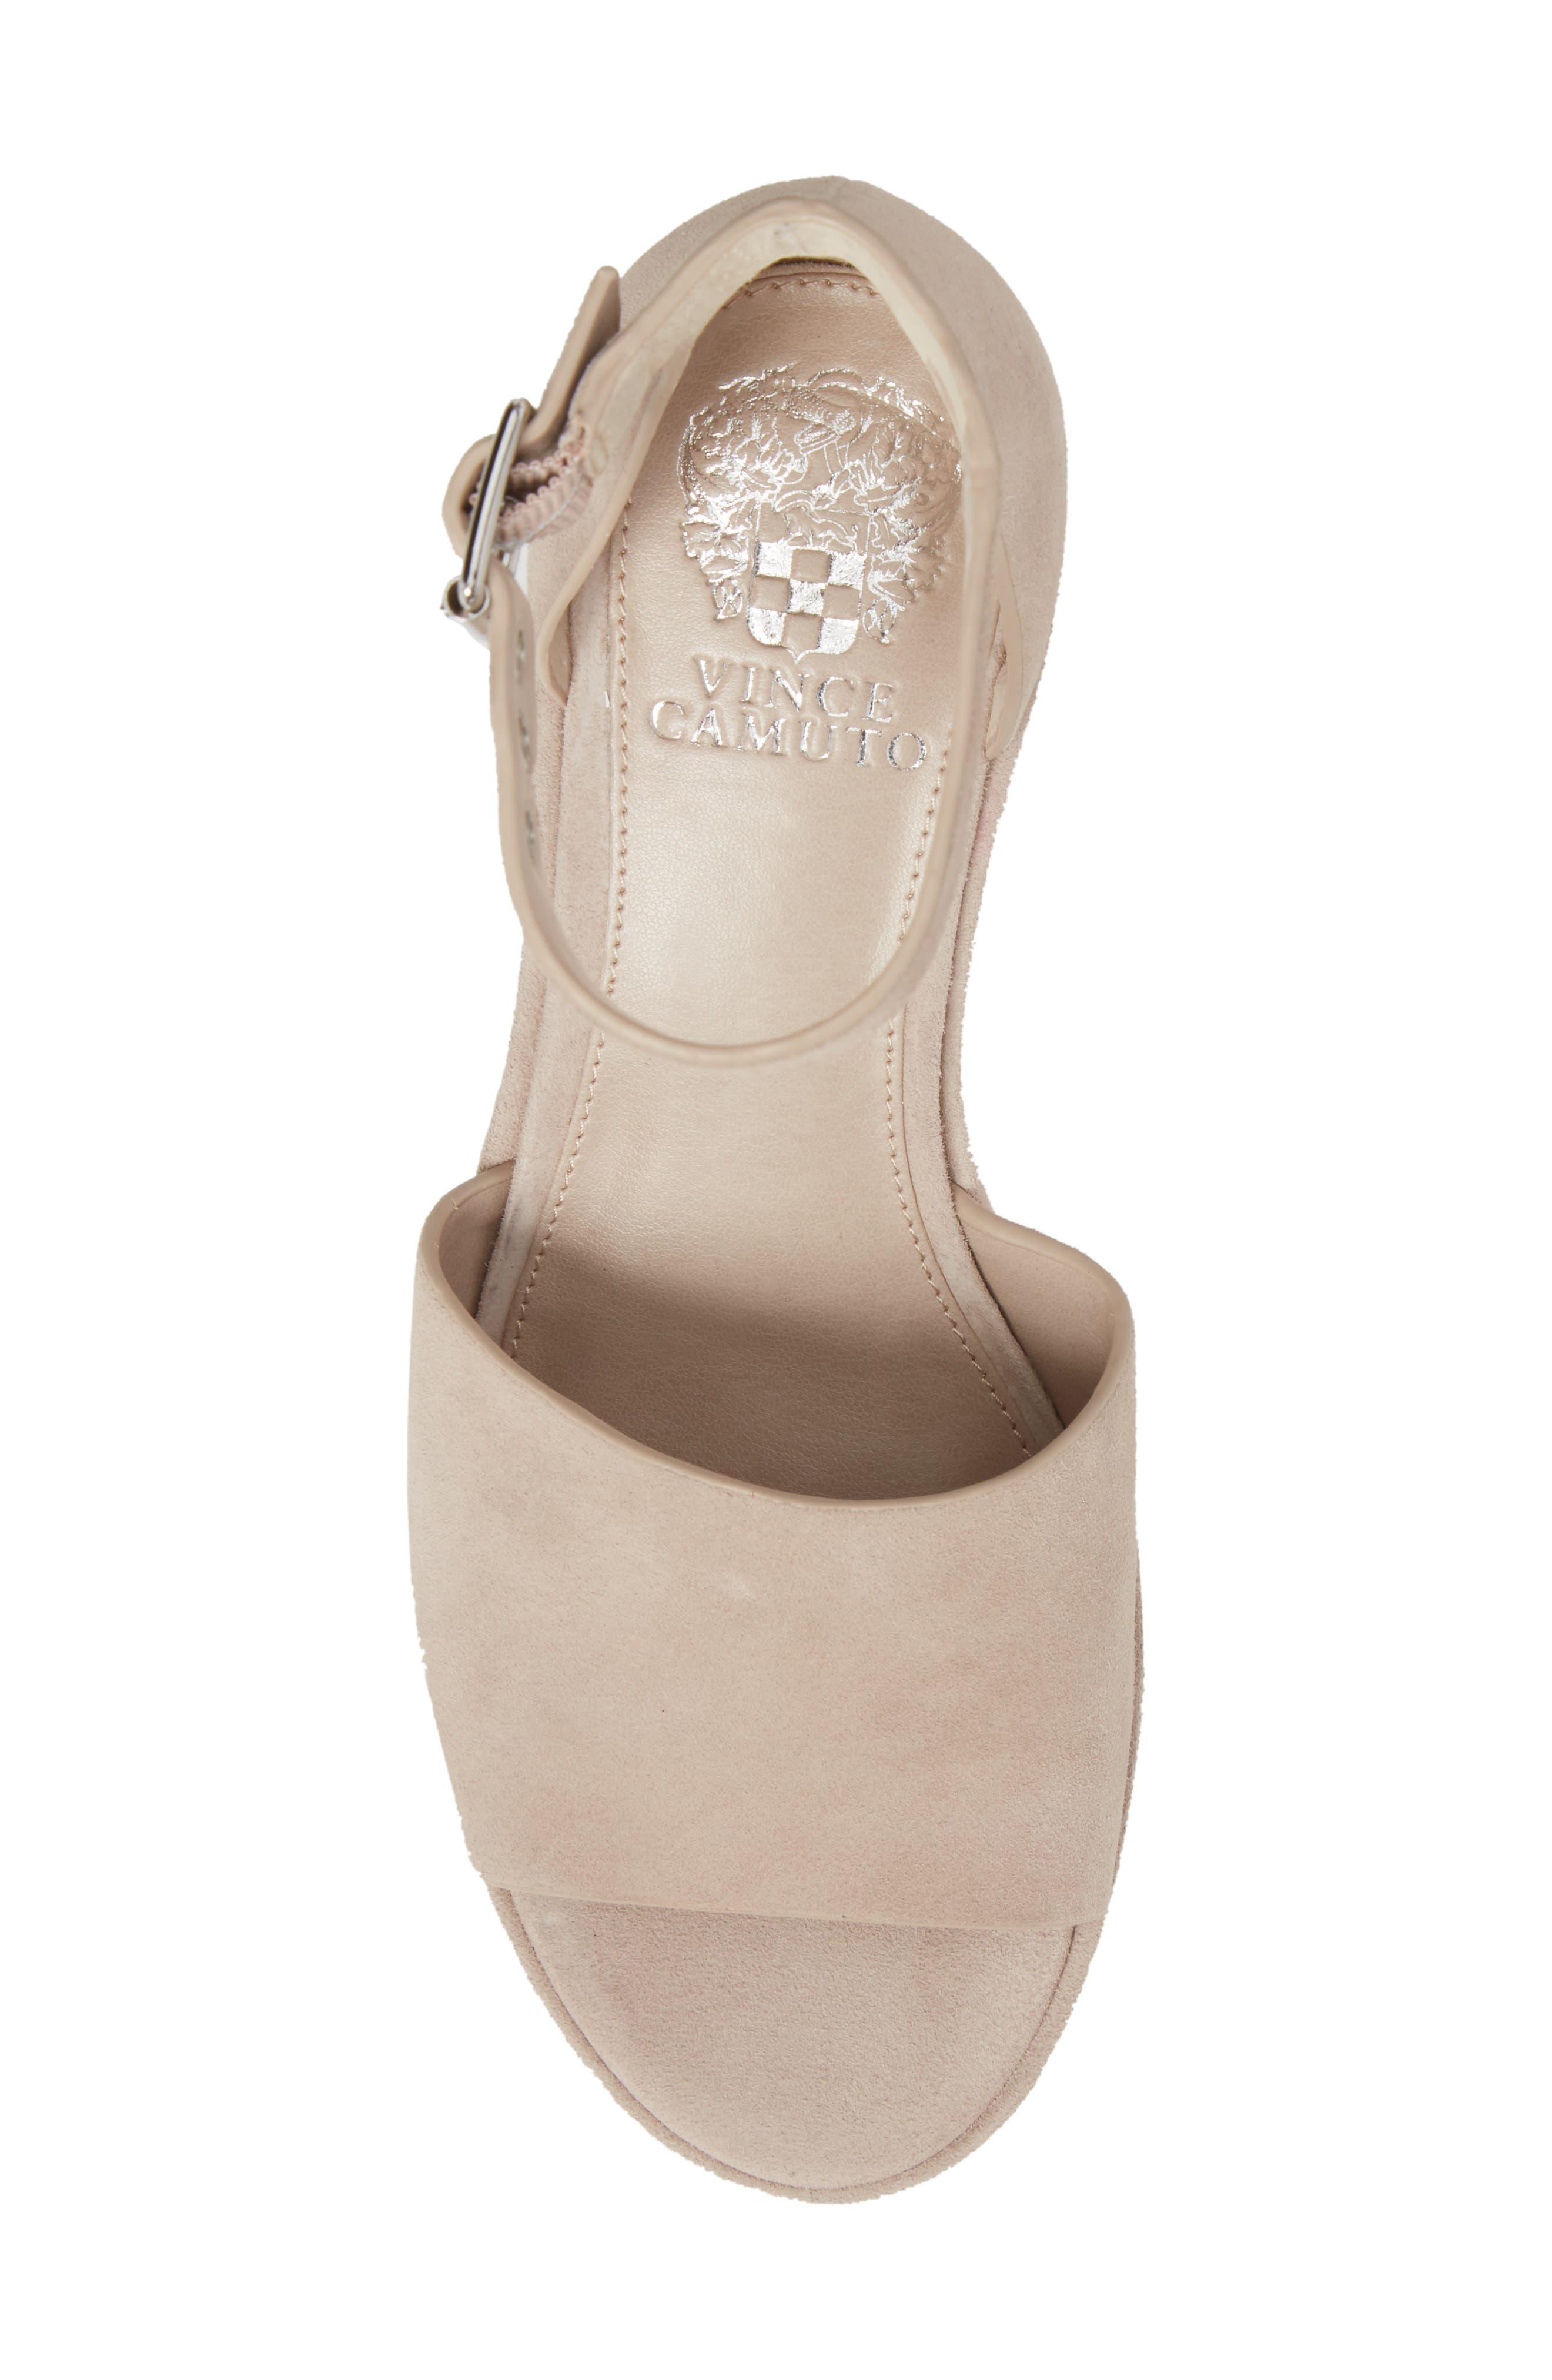 Korista Platform Sandal,                             Alternate thumbnail 5, color,                             Tipsy Taupe Suede